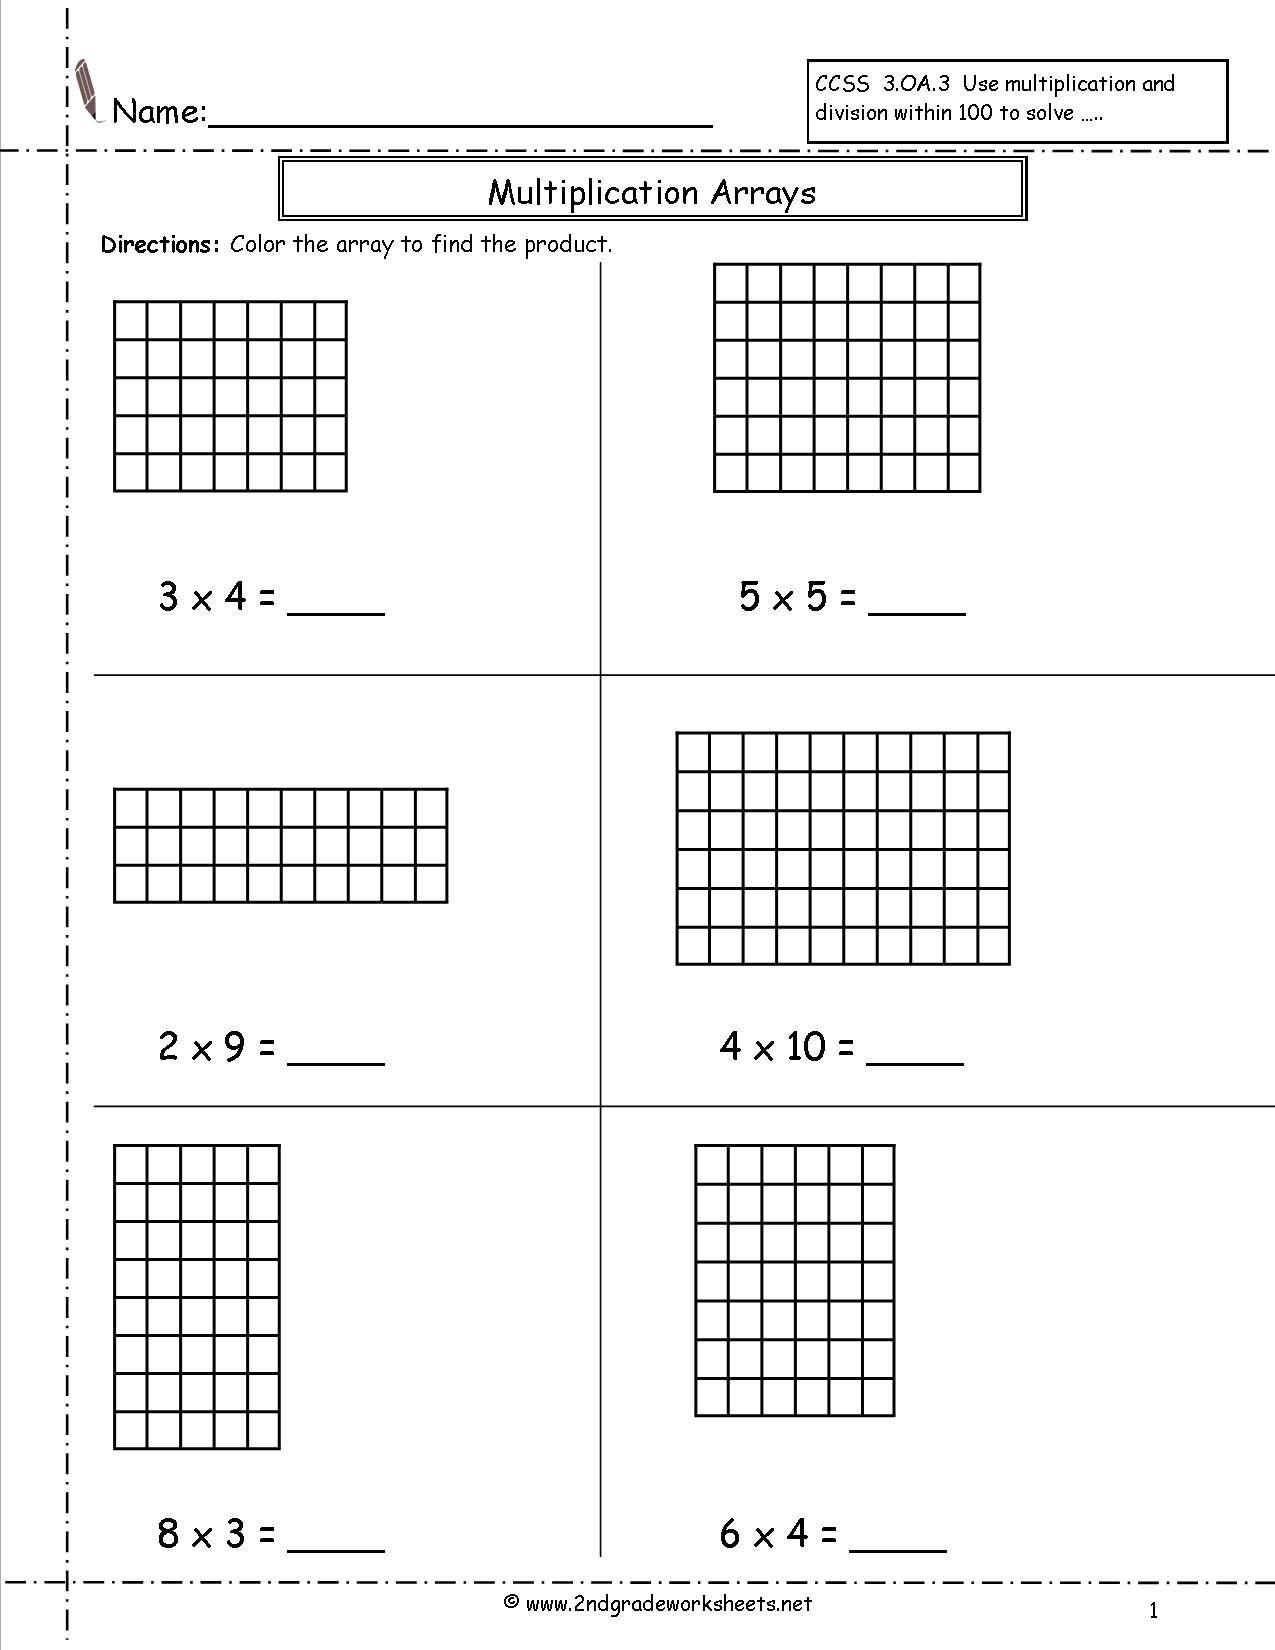 Arrays Worksheets | Multiplication Arrays Worksheets | Array within Multiplication Worksheets Area Model